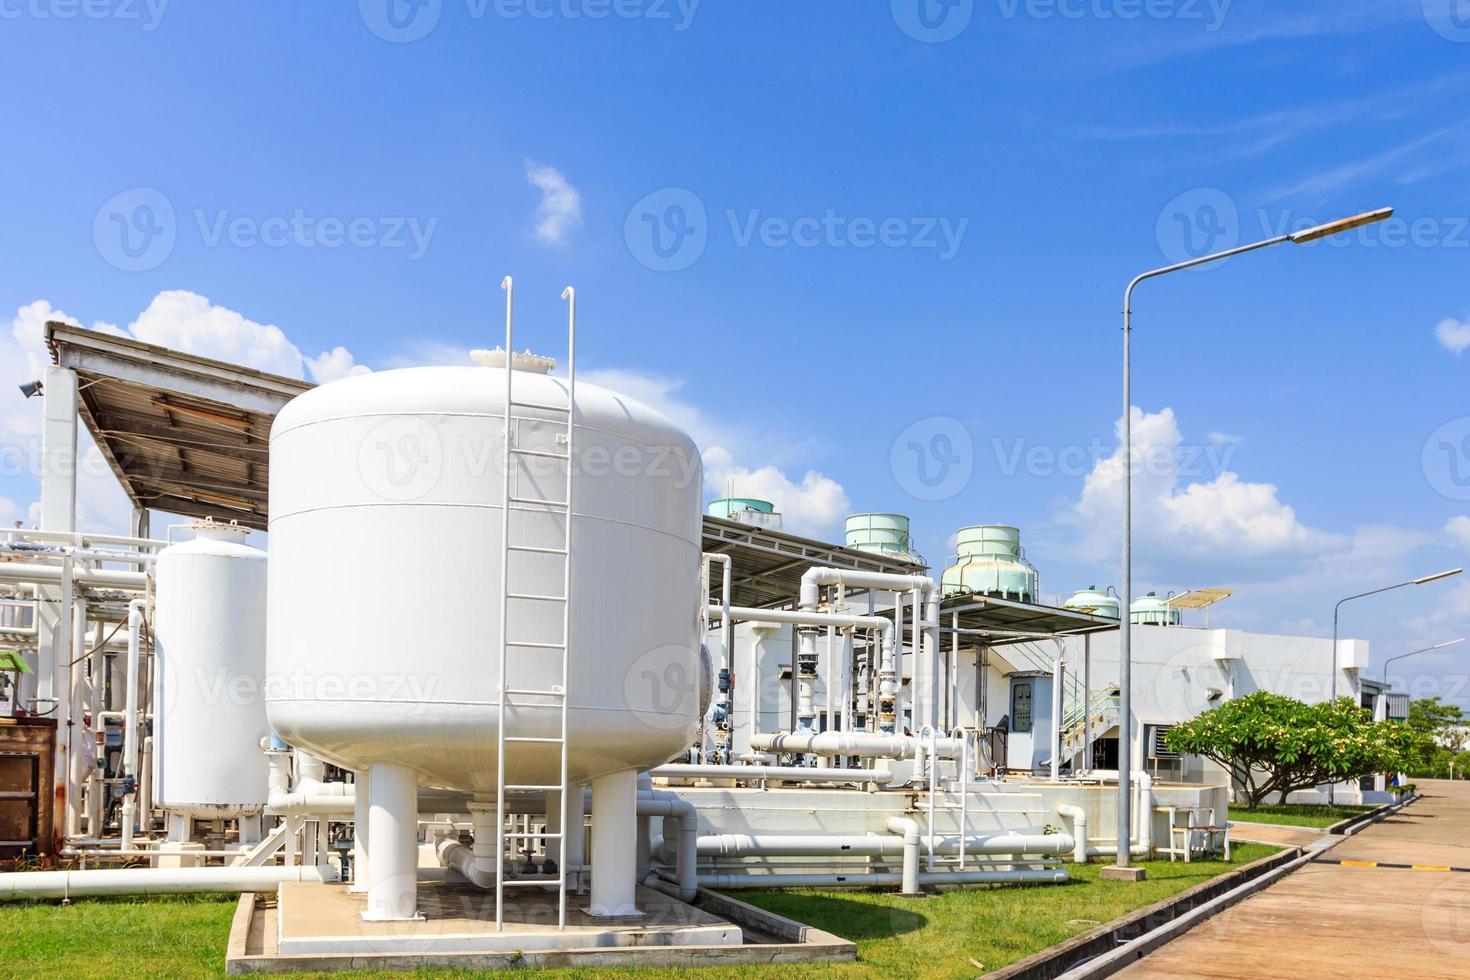 chemietank in fabriek met blauwe hemel foto